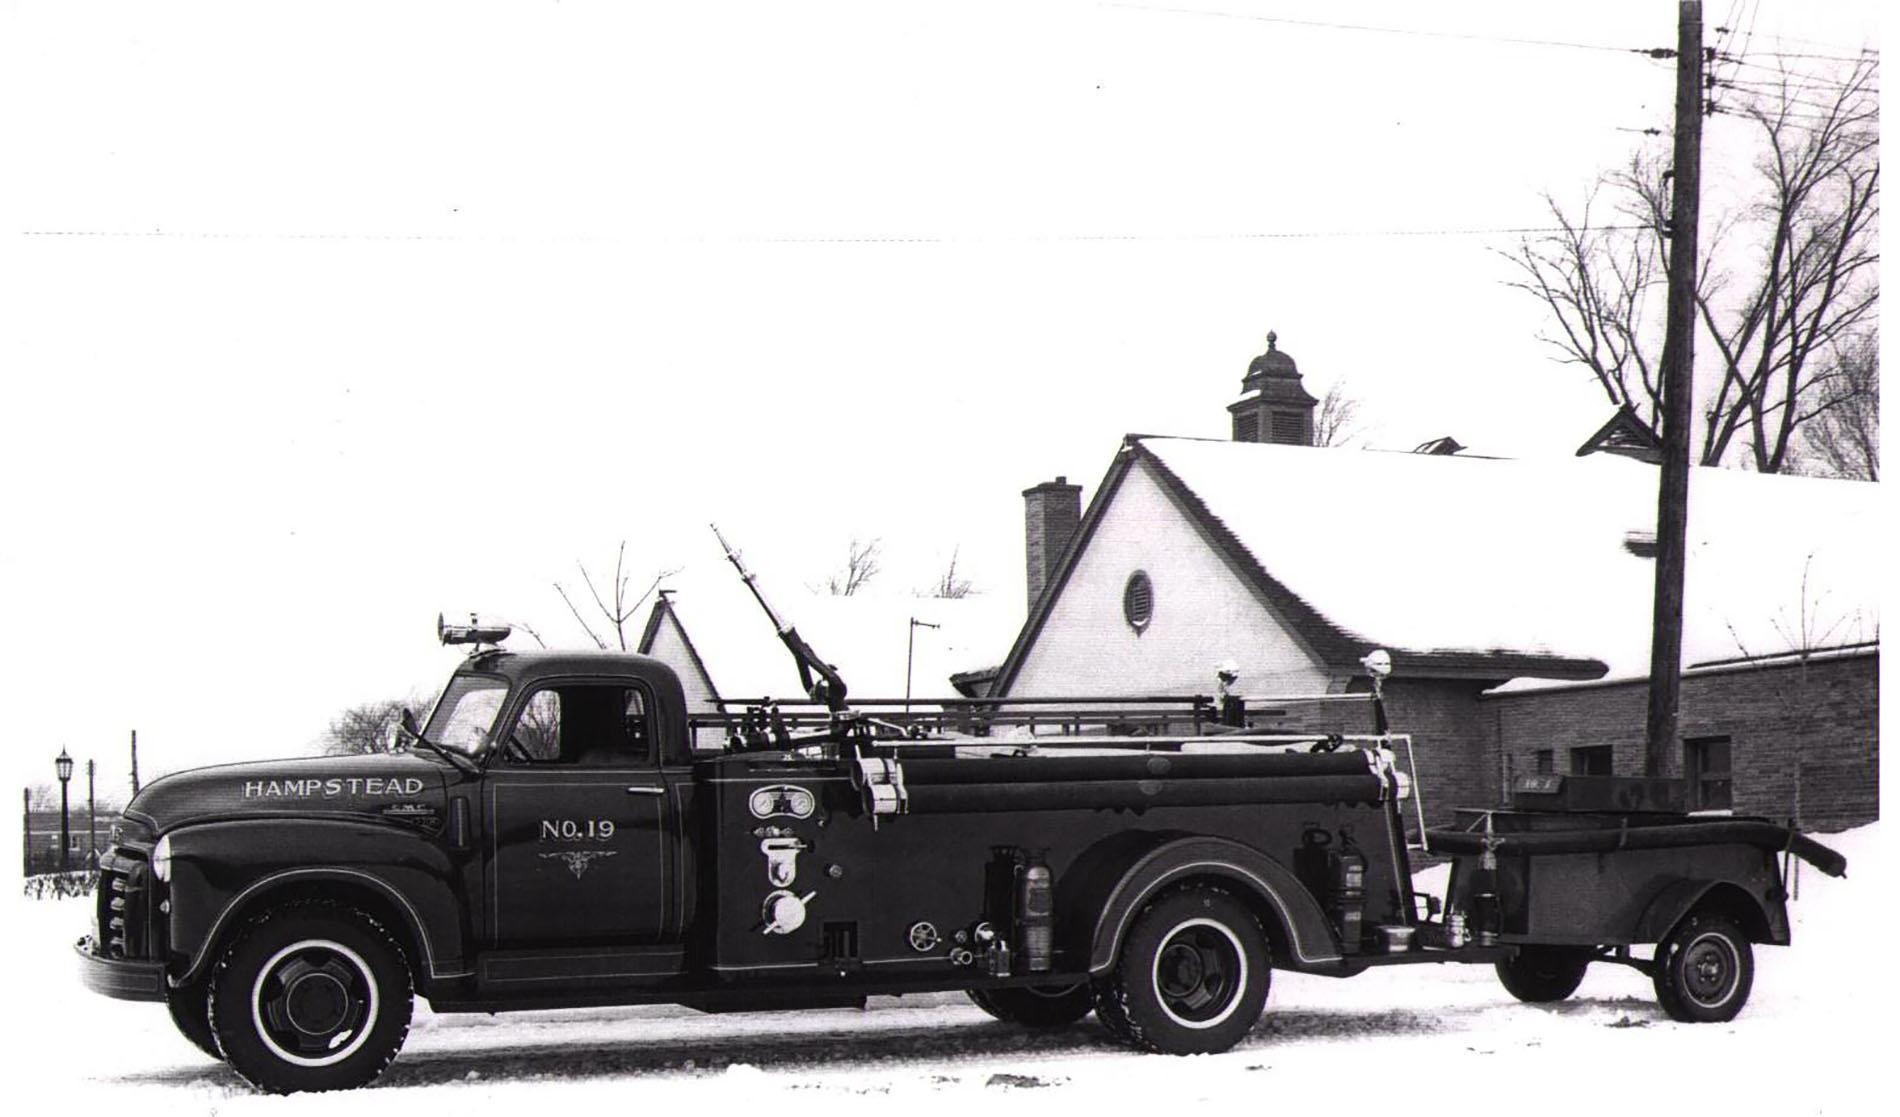 GMC Hampstead 1952 3 quarter Ton